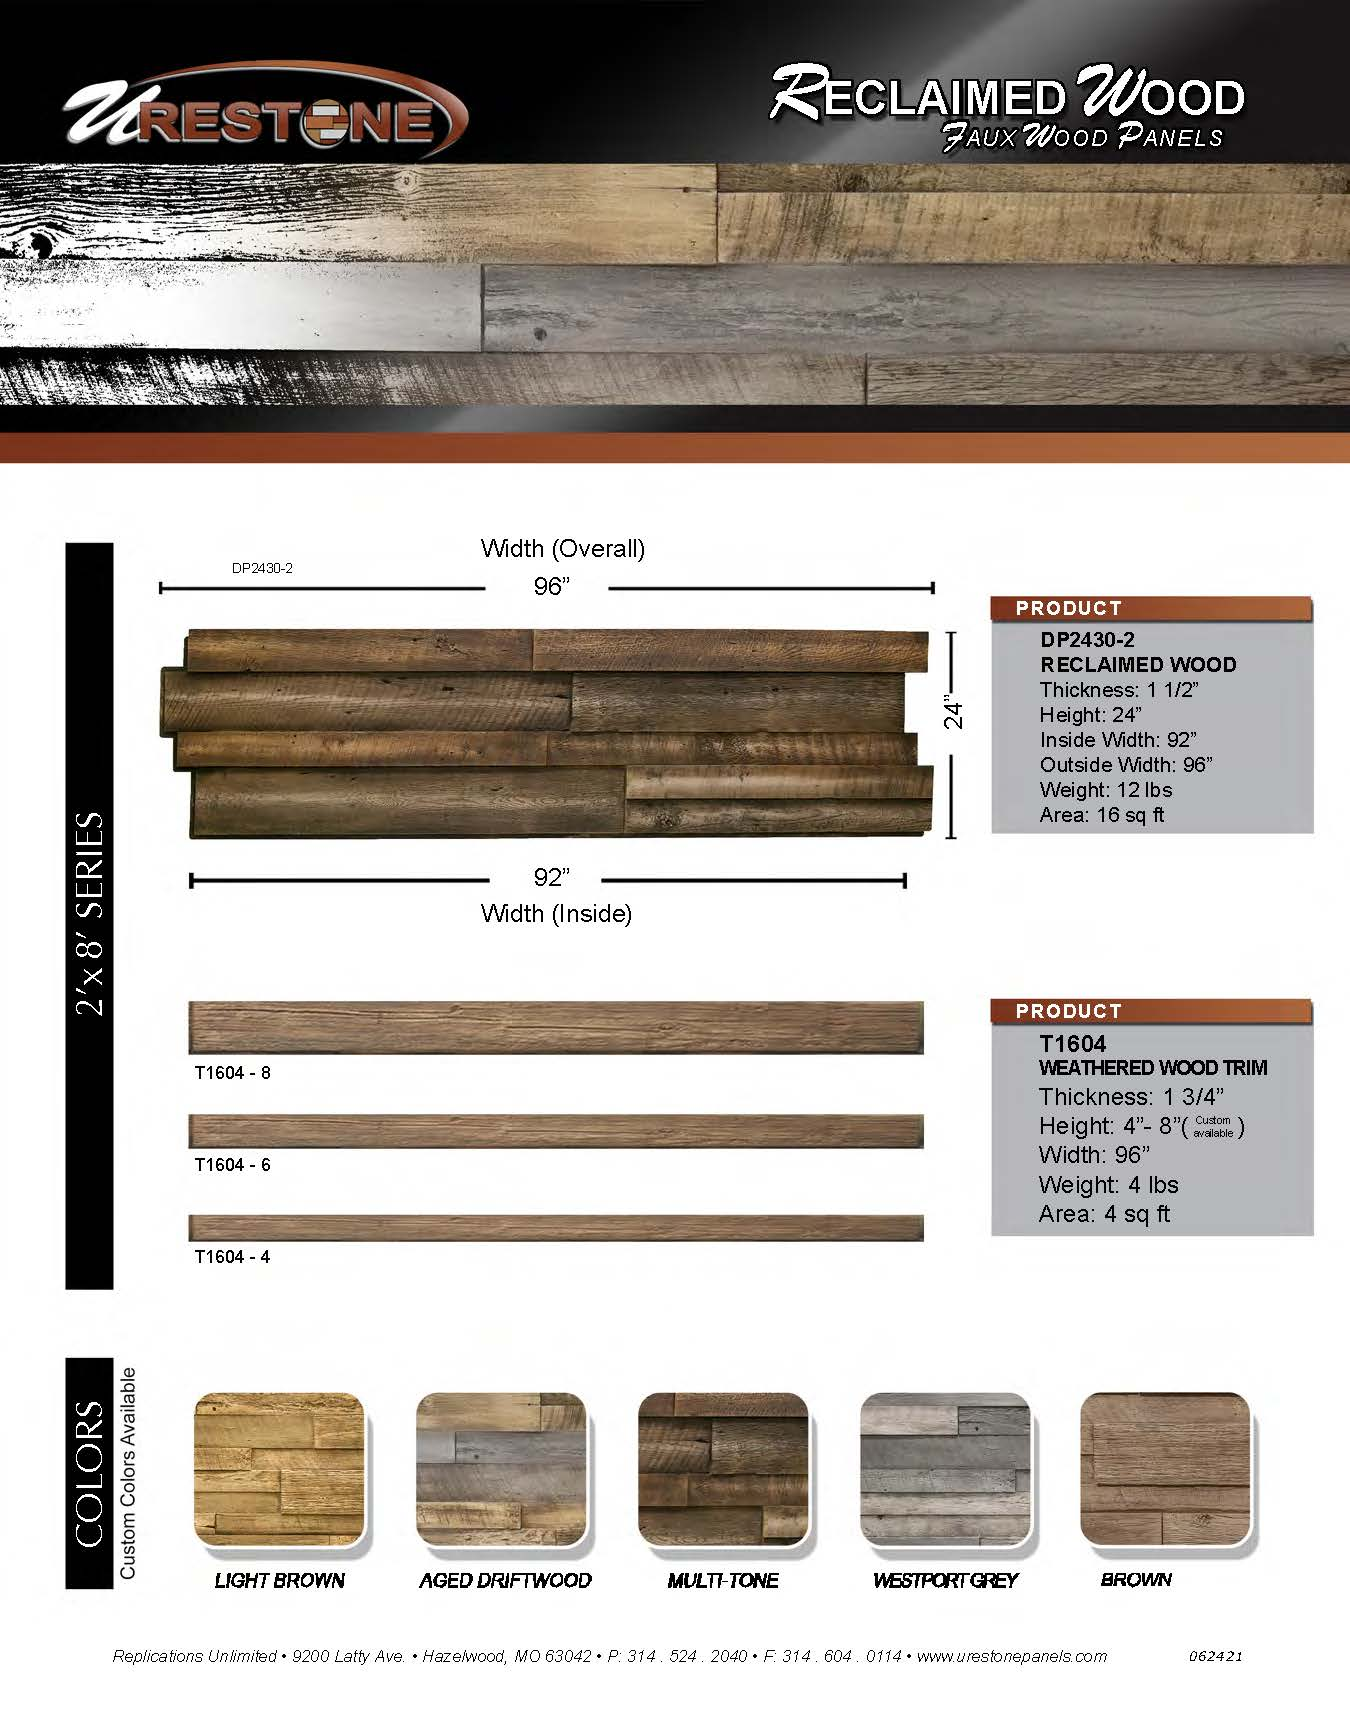 Reclaimed Wood Data Sheet